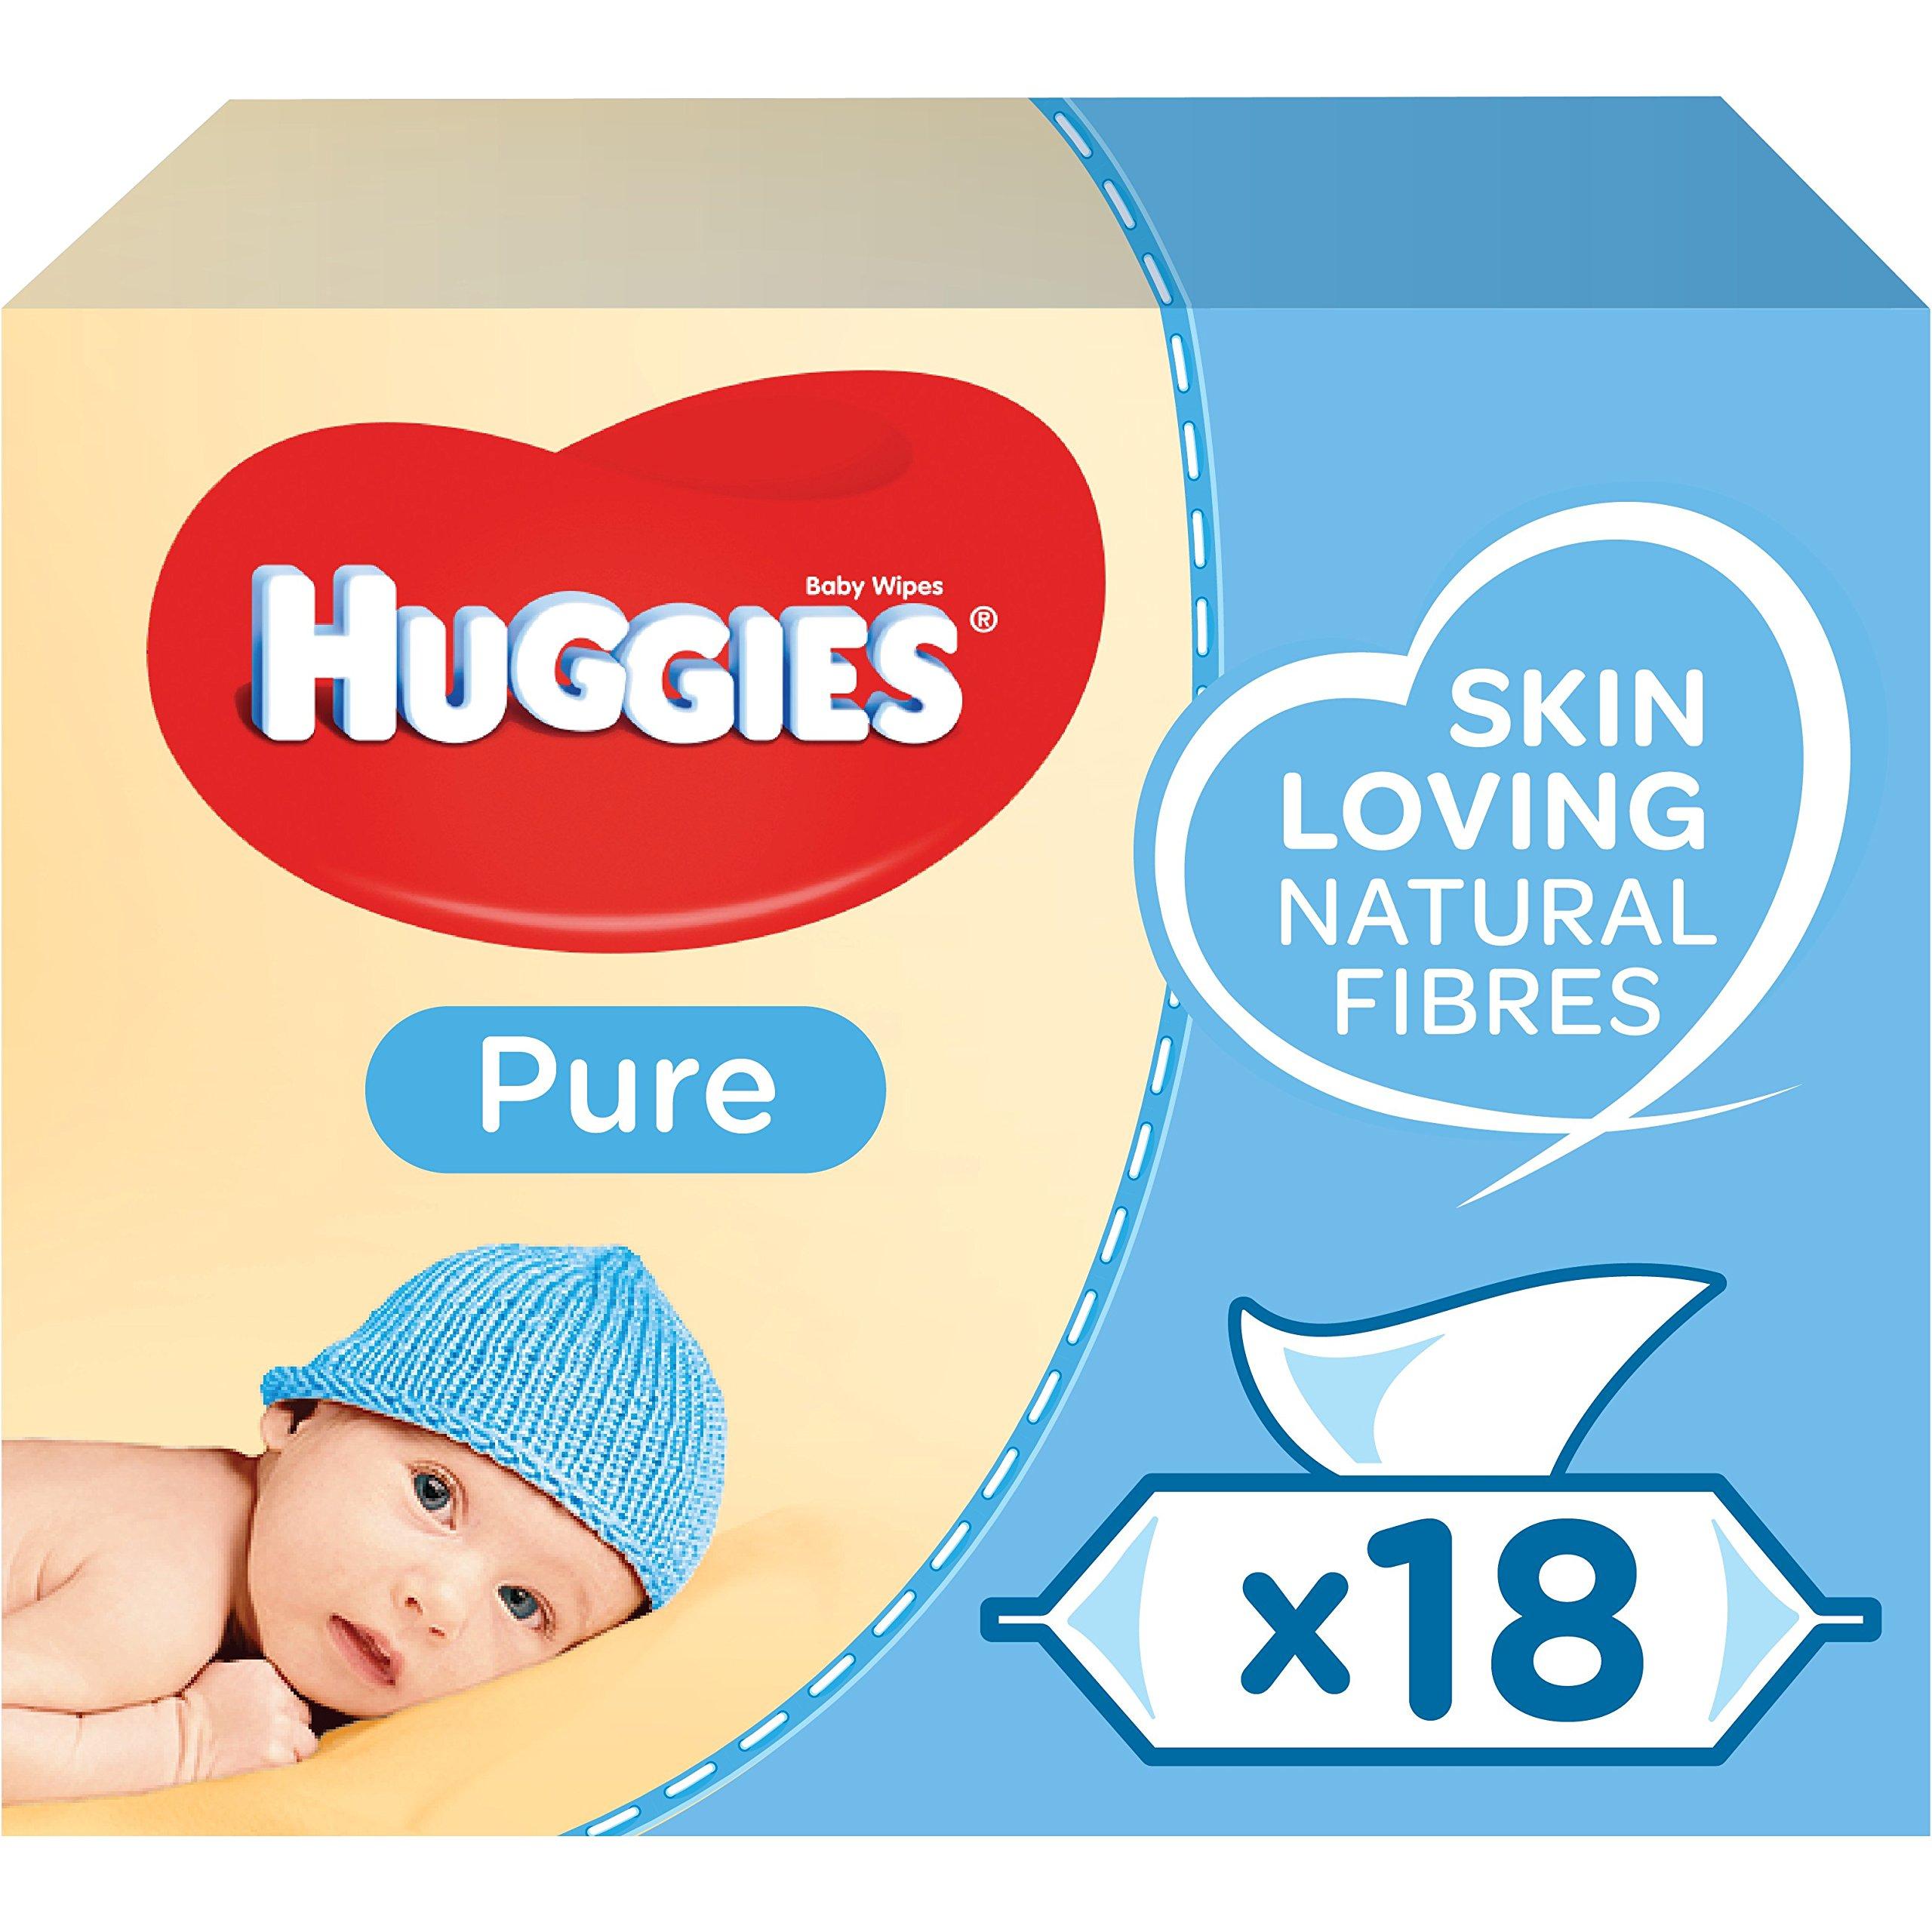 Huggies Pure Toallitas para Bebé - Toallitas, 18 paquetes de 56 unidades product image